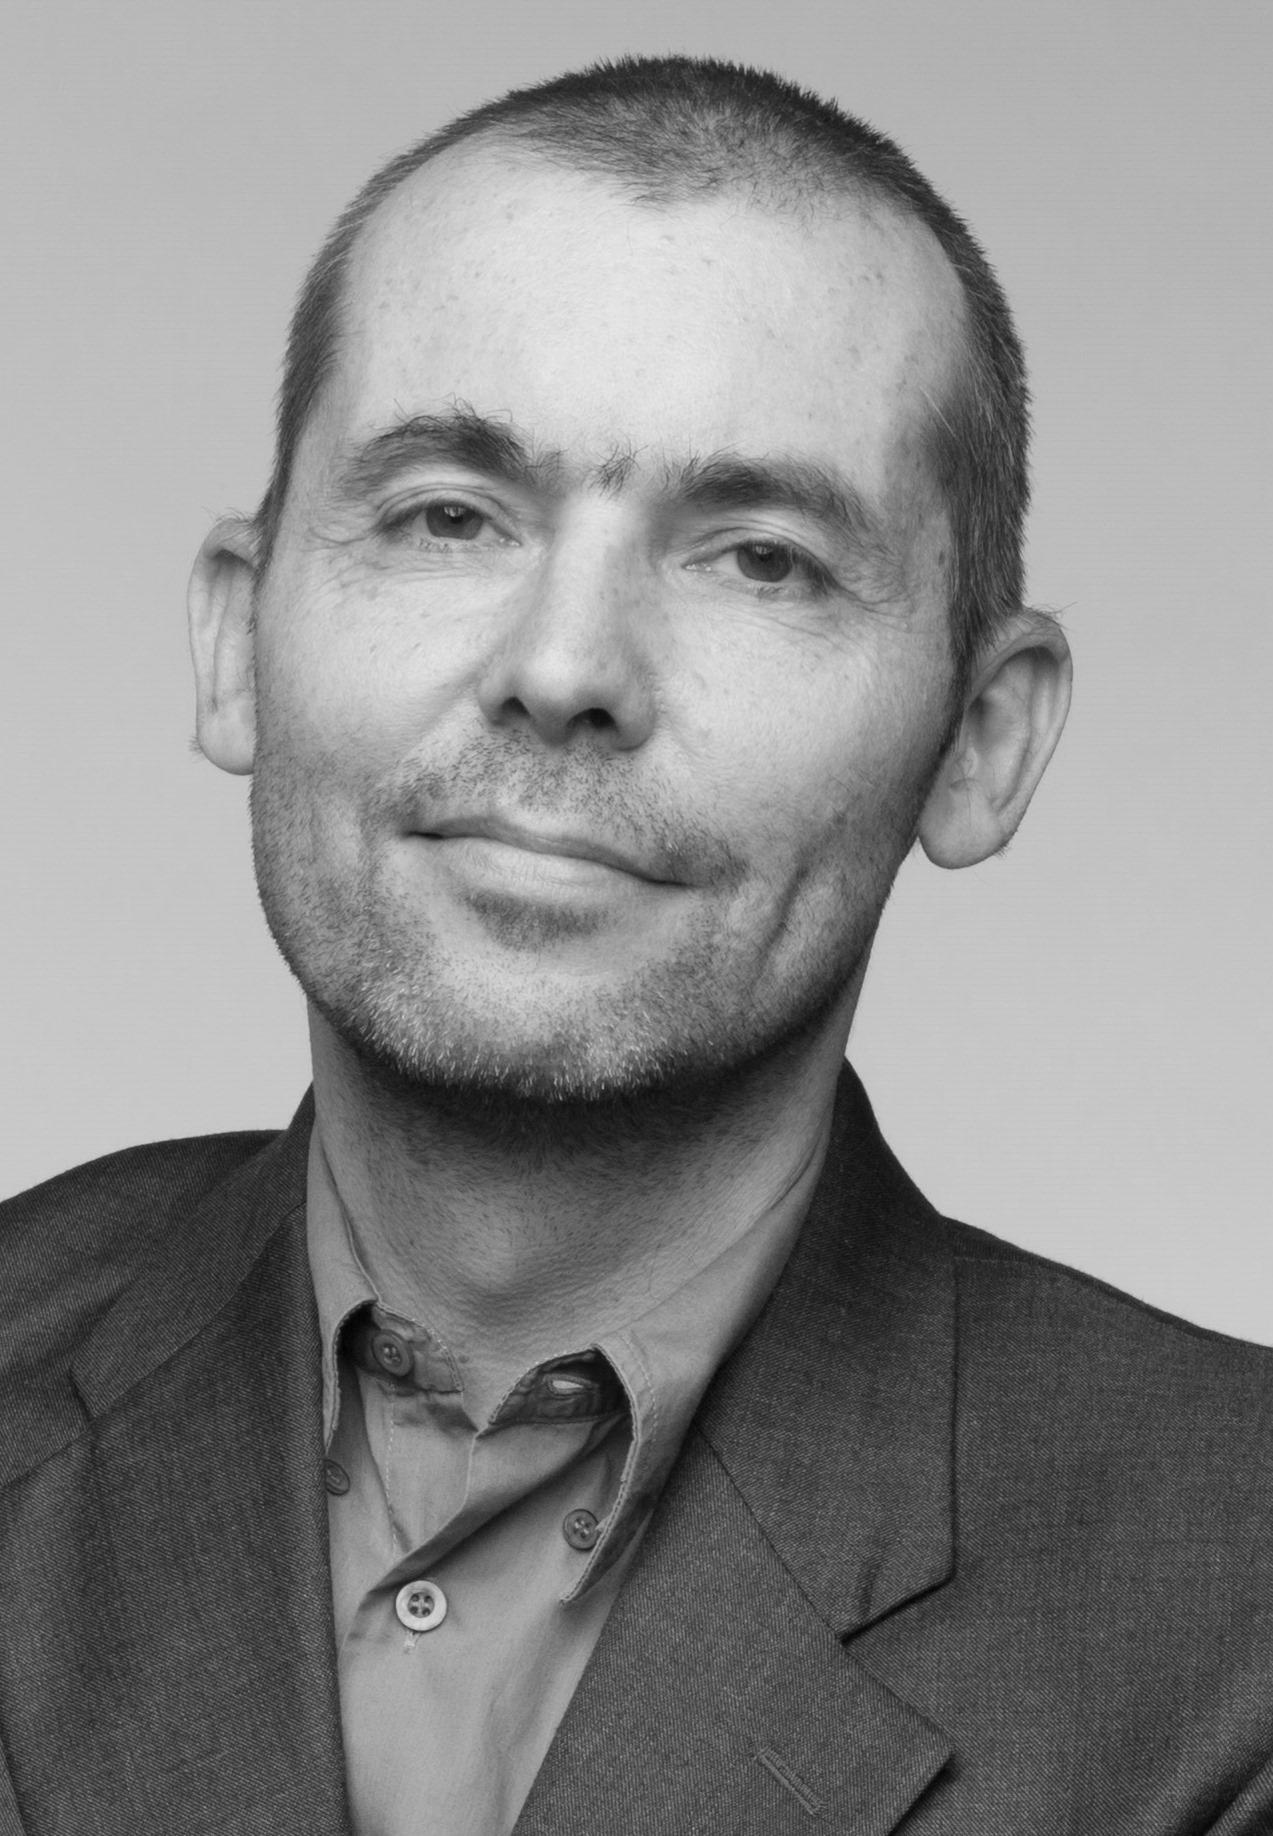 Thomas Fitzner von der Kanzlei European@ccounting